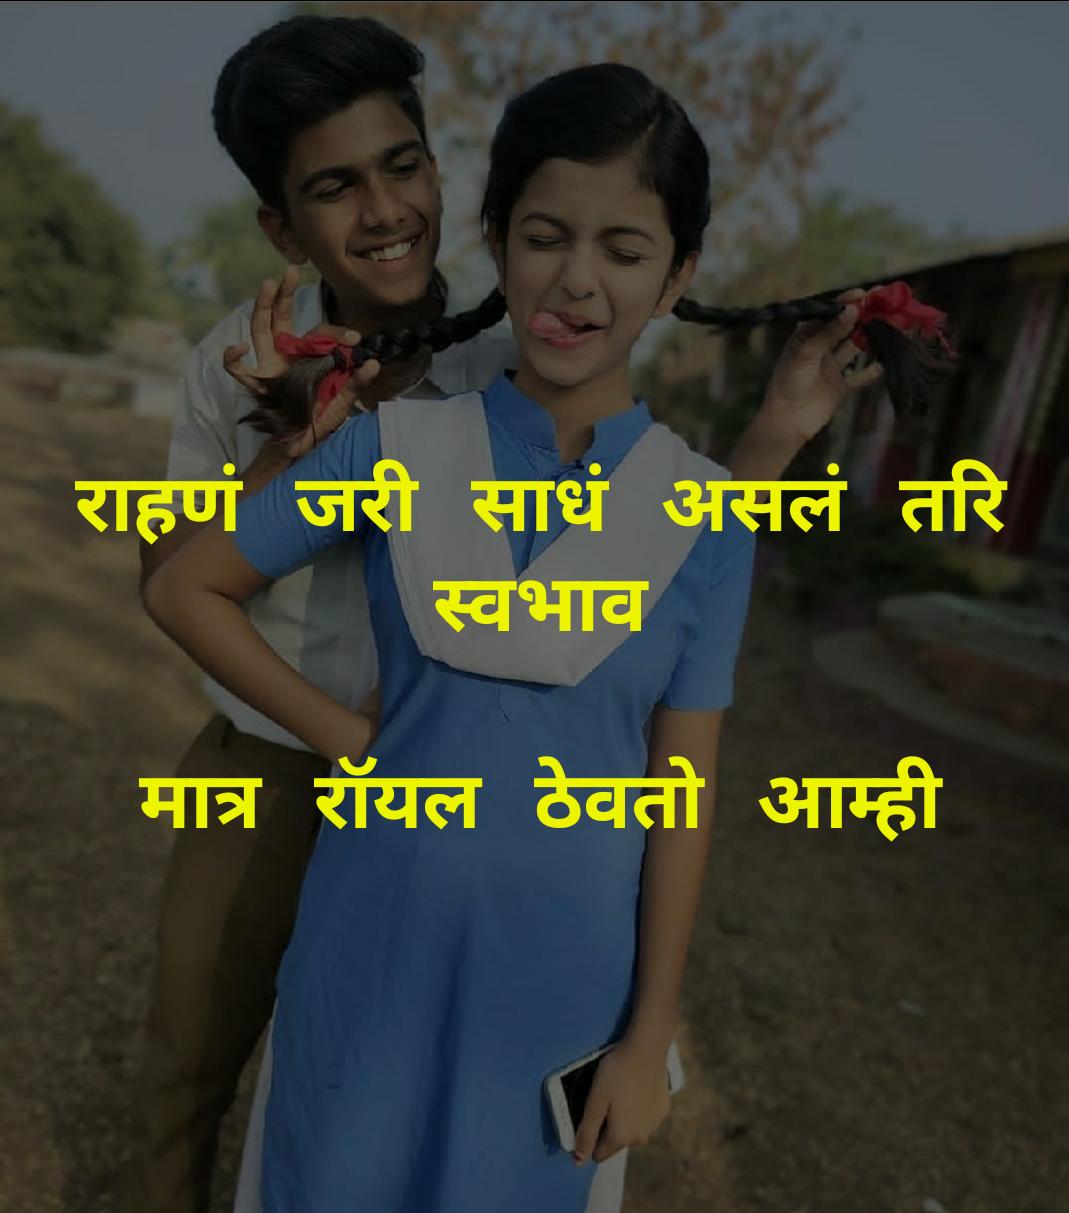 status in marathi for girl, cute status for girl in marathi, love status in marathi for girl